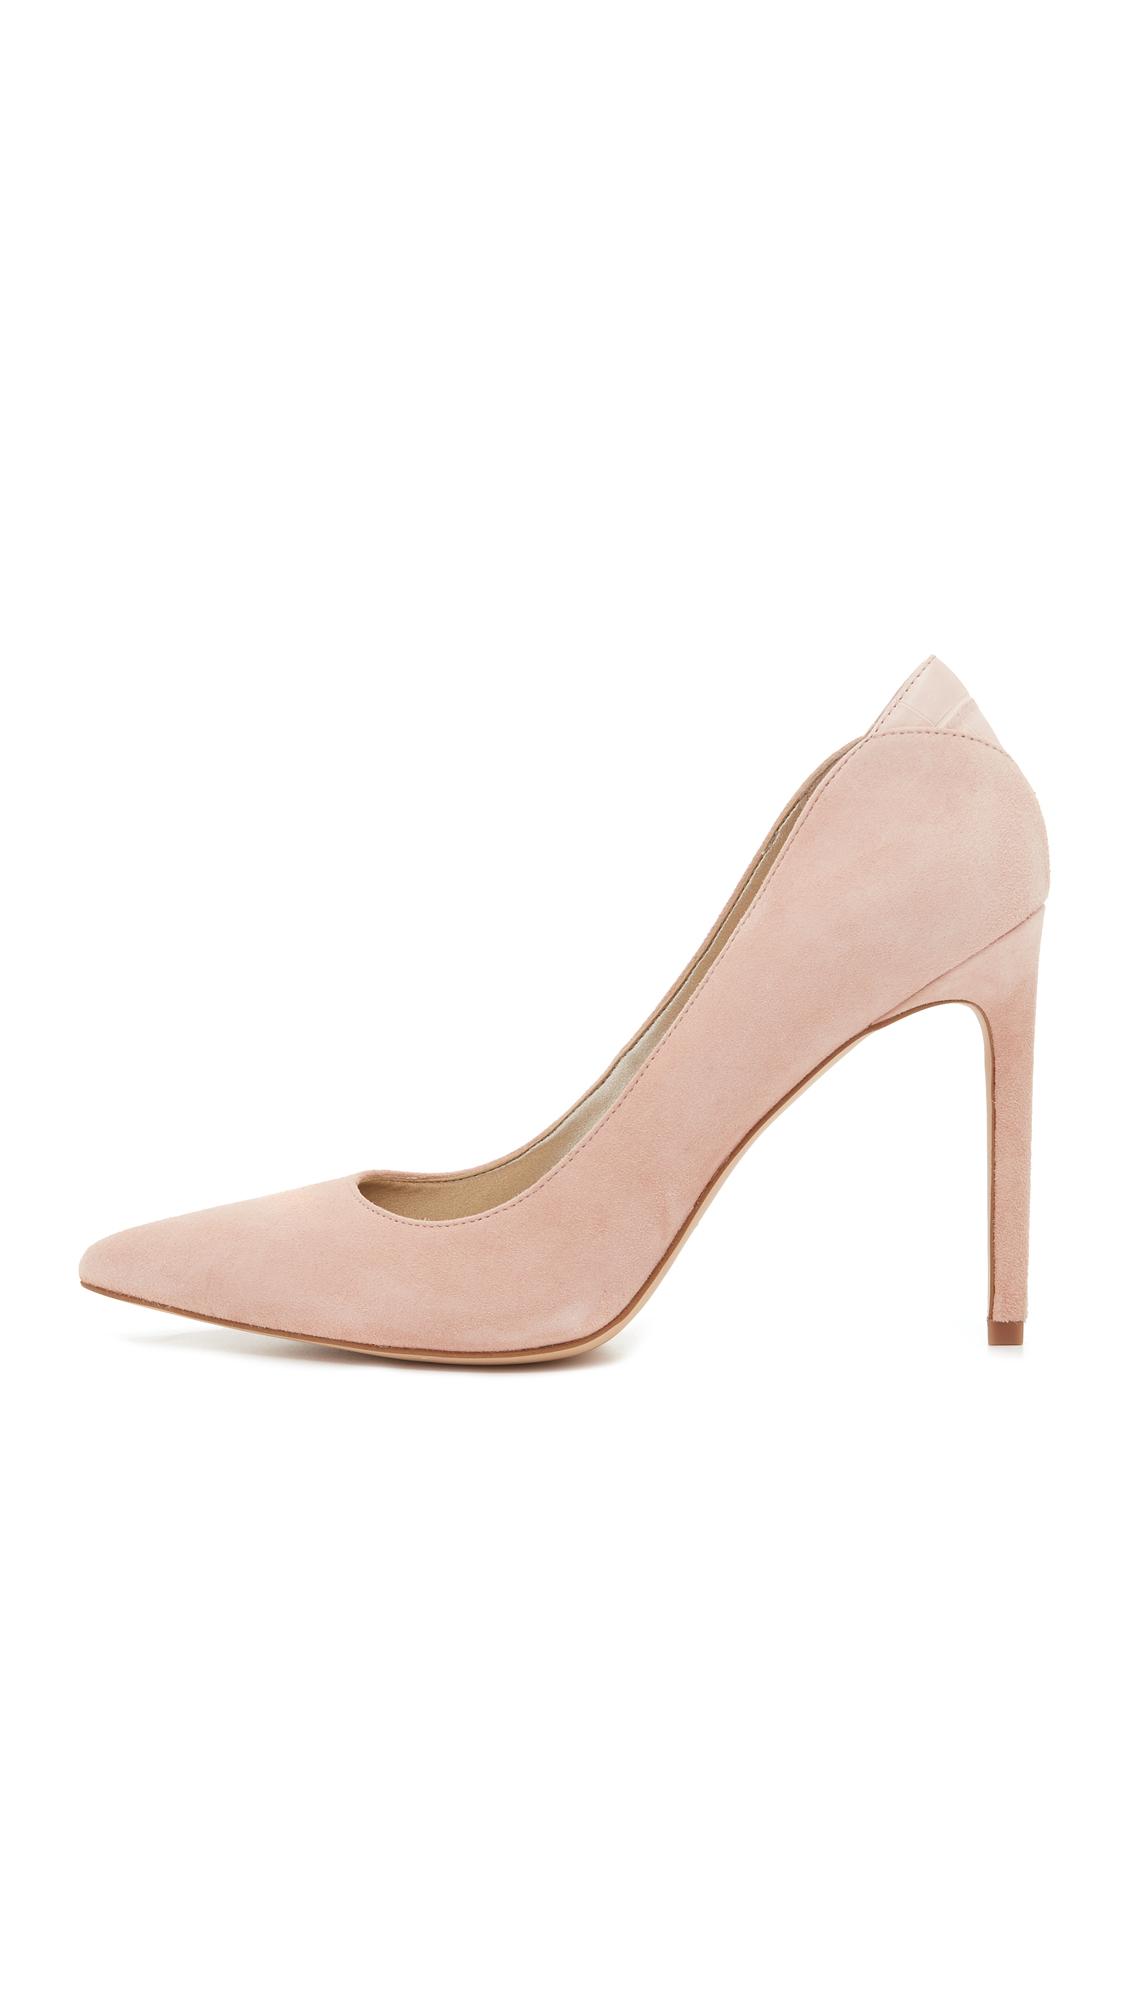 a6613ba0cae Lyst - Sam Edelman Dea Pumps in Pink